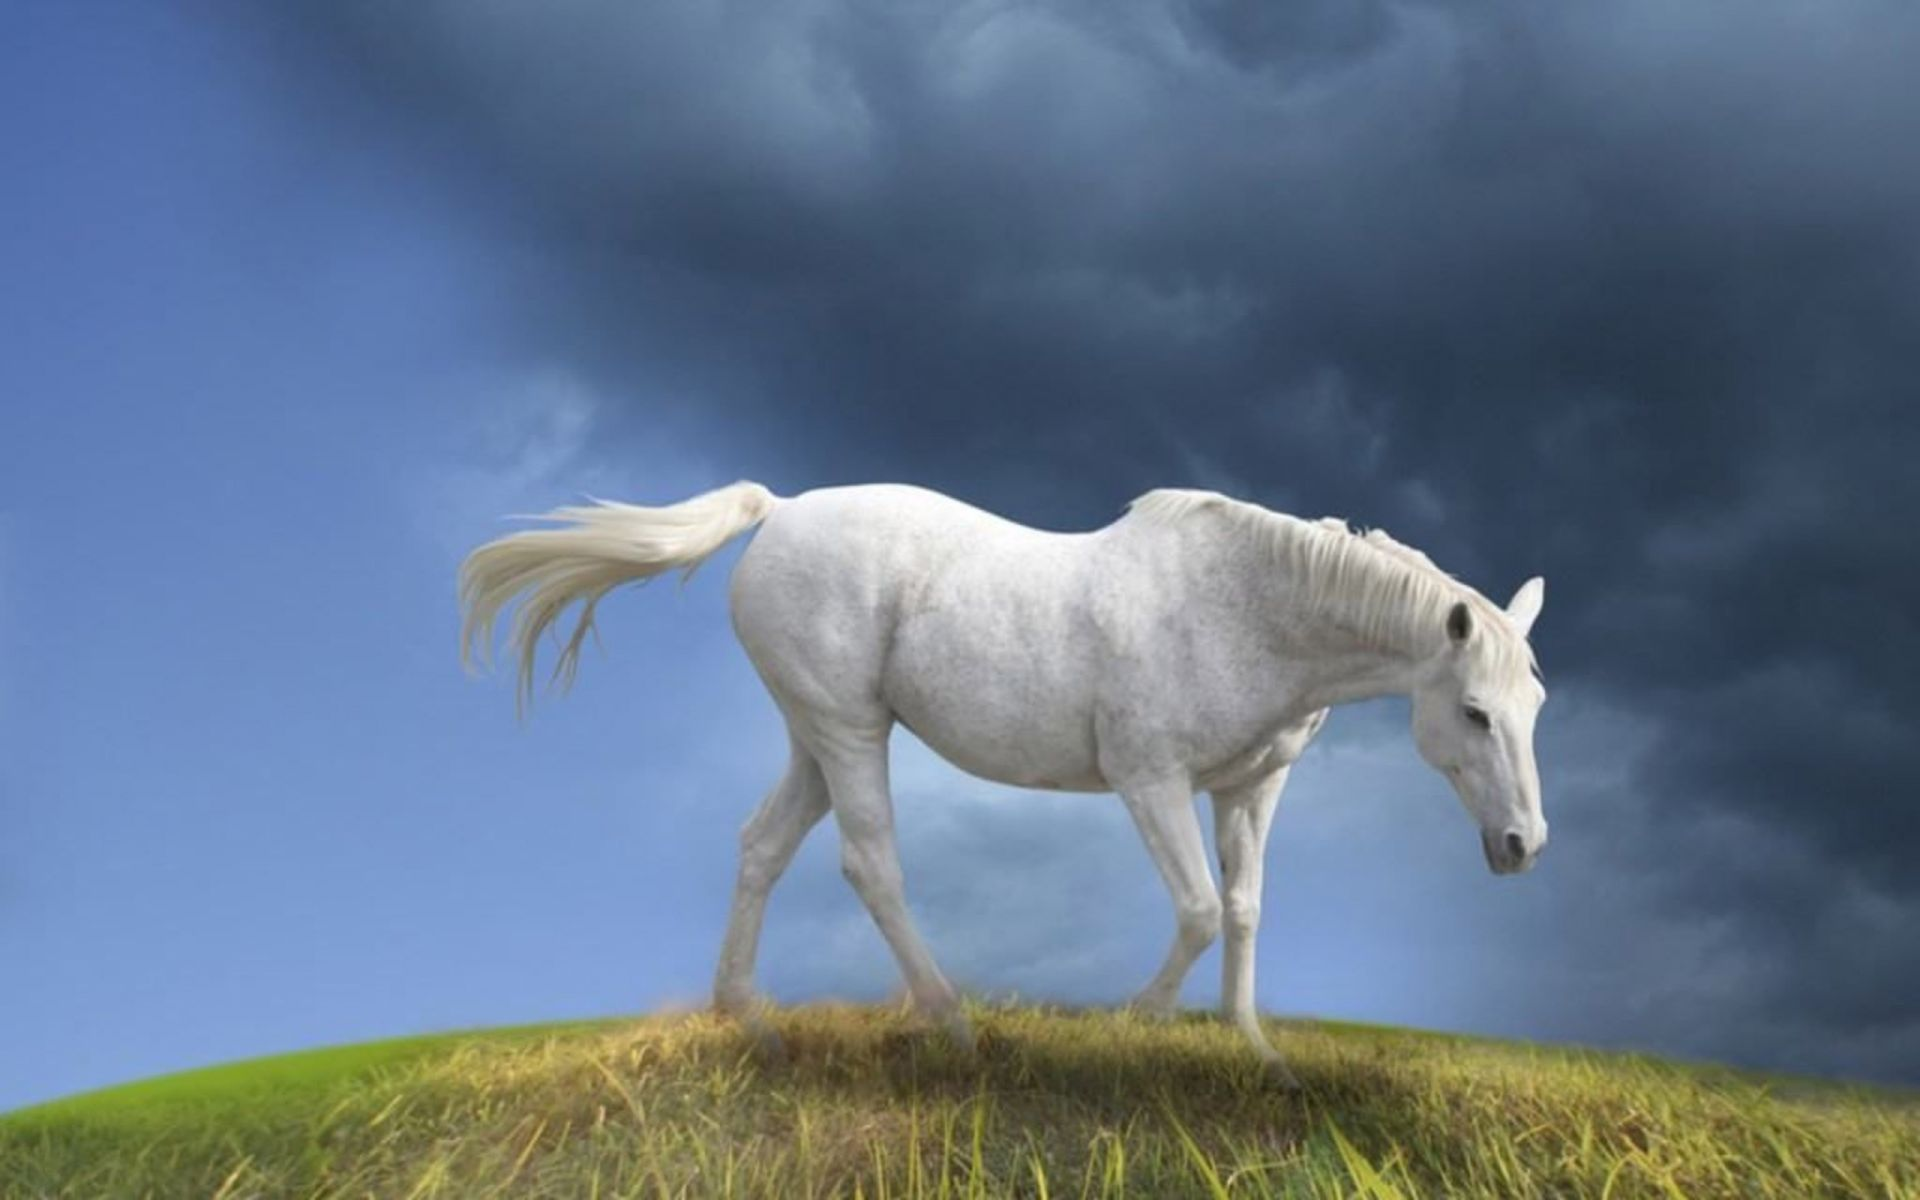 Cool Wallpaper Horse Beauty - 05b94a34204fdcd1c8e24df616527b1f  Snapshot_3853.jpg